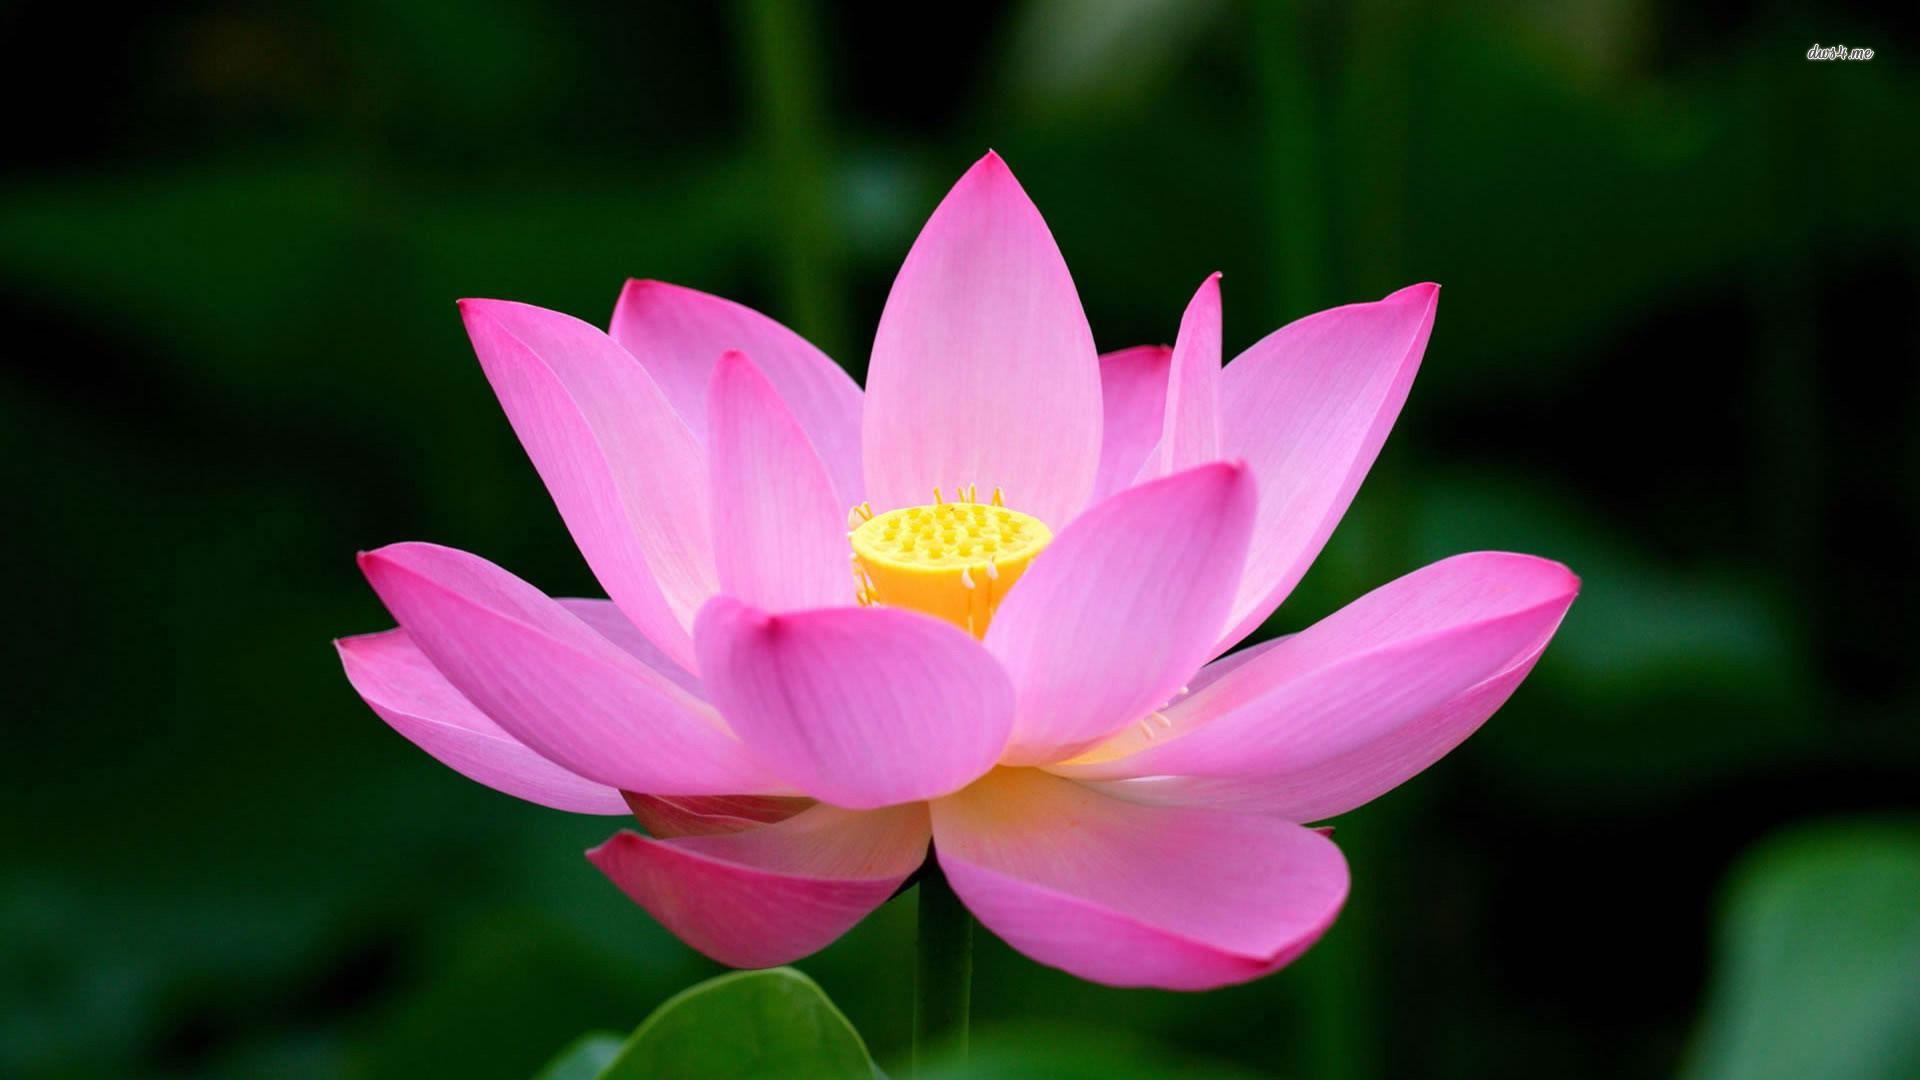 Lotus hd wallpaper 73 images 1920x1080 pink lotus wallpaper 1920x1080 more flowers lotus izmirmasajfo